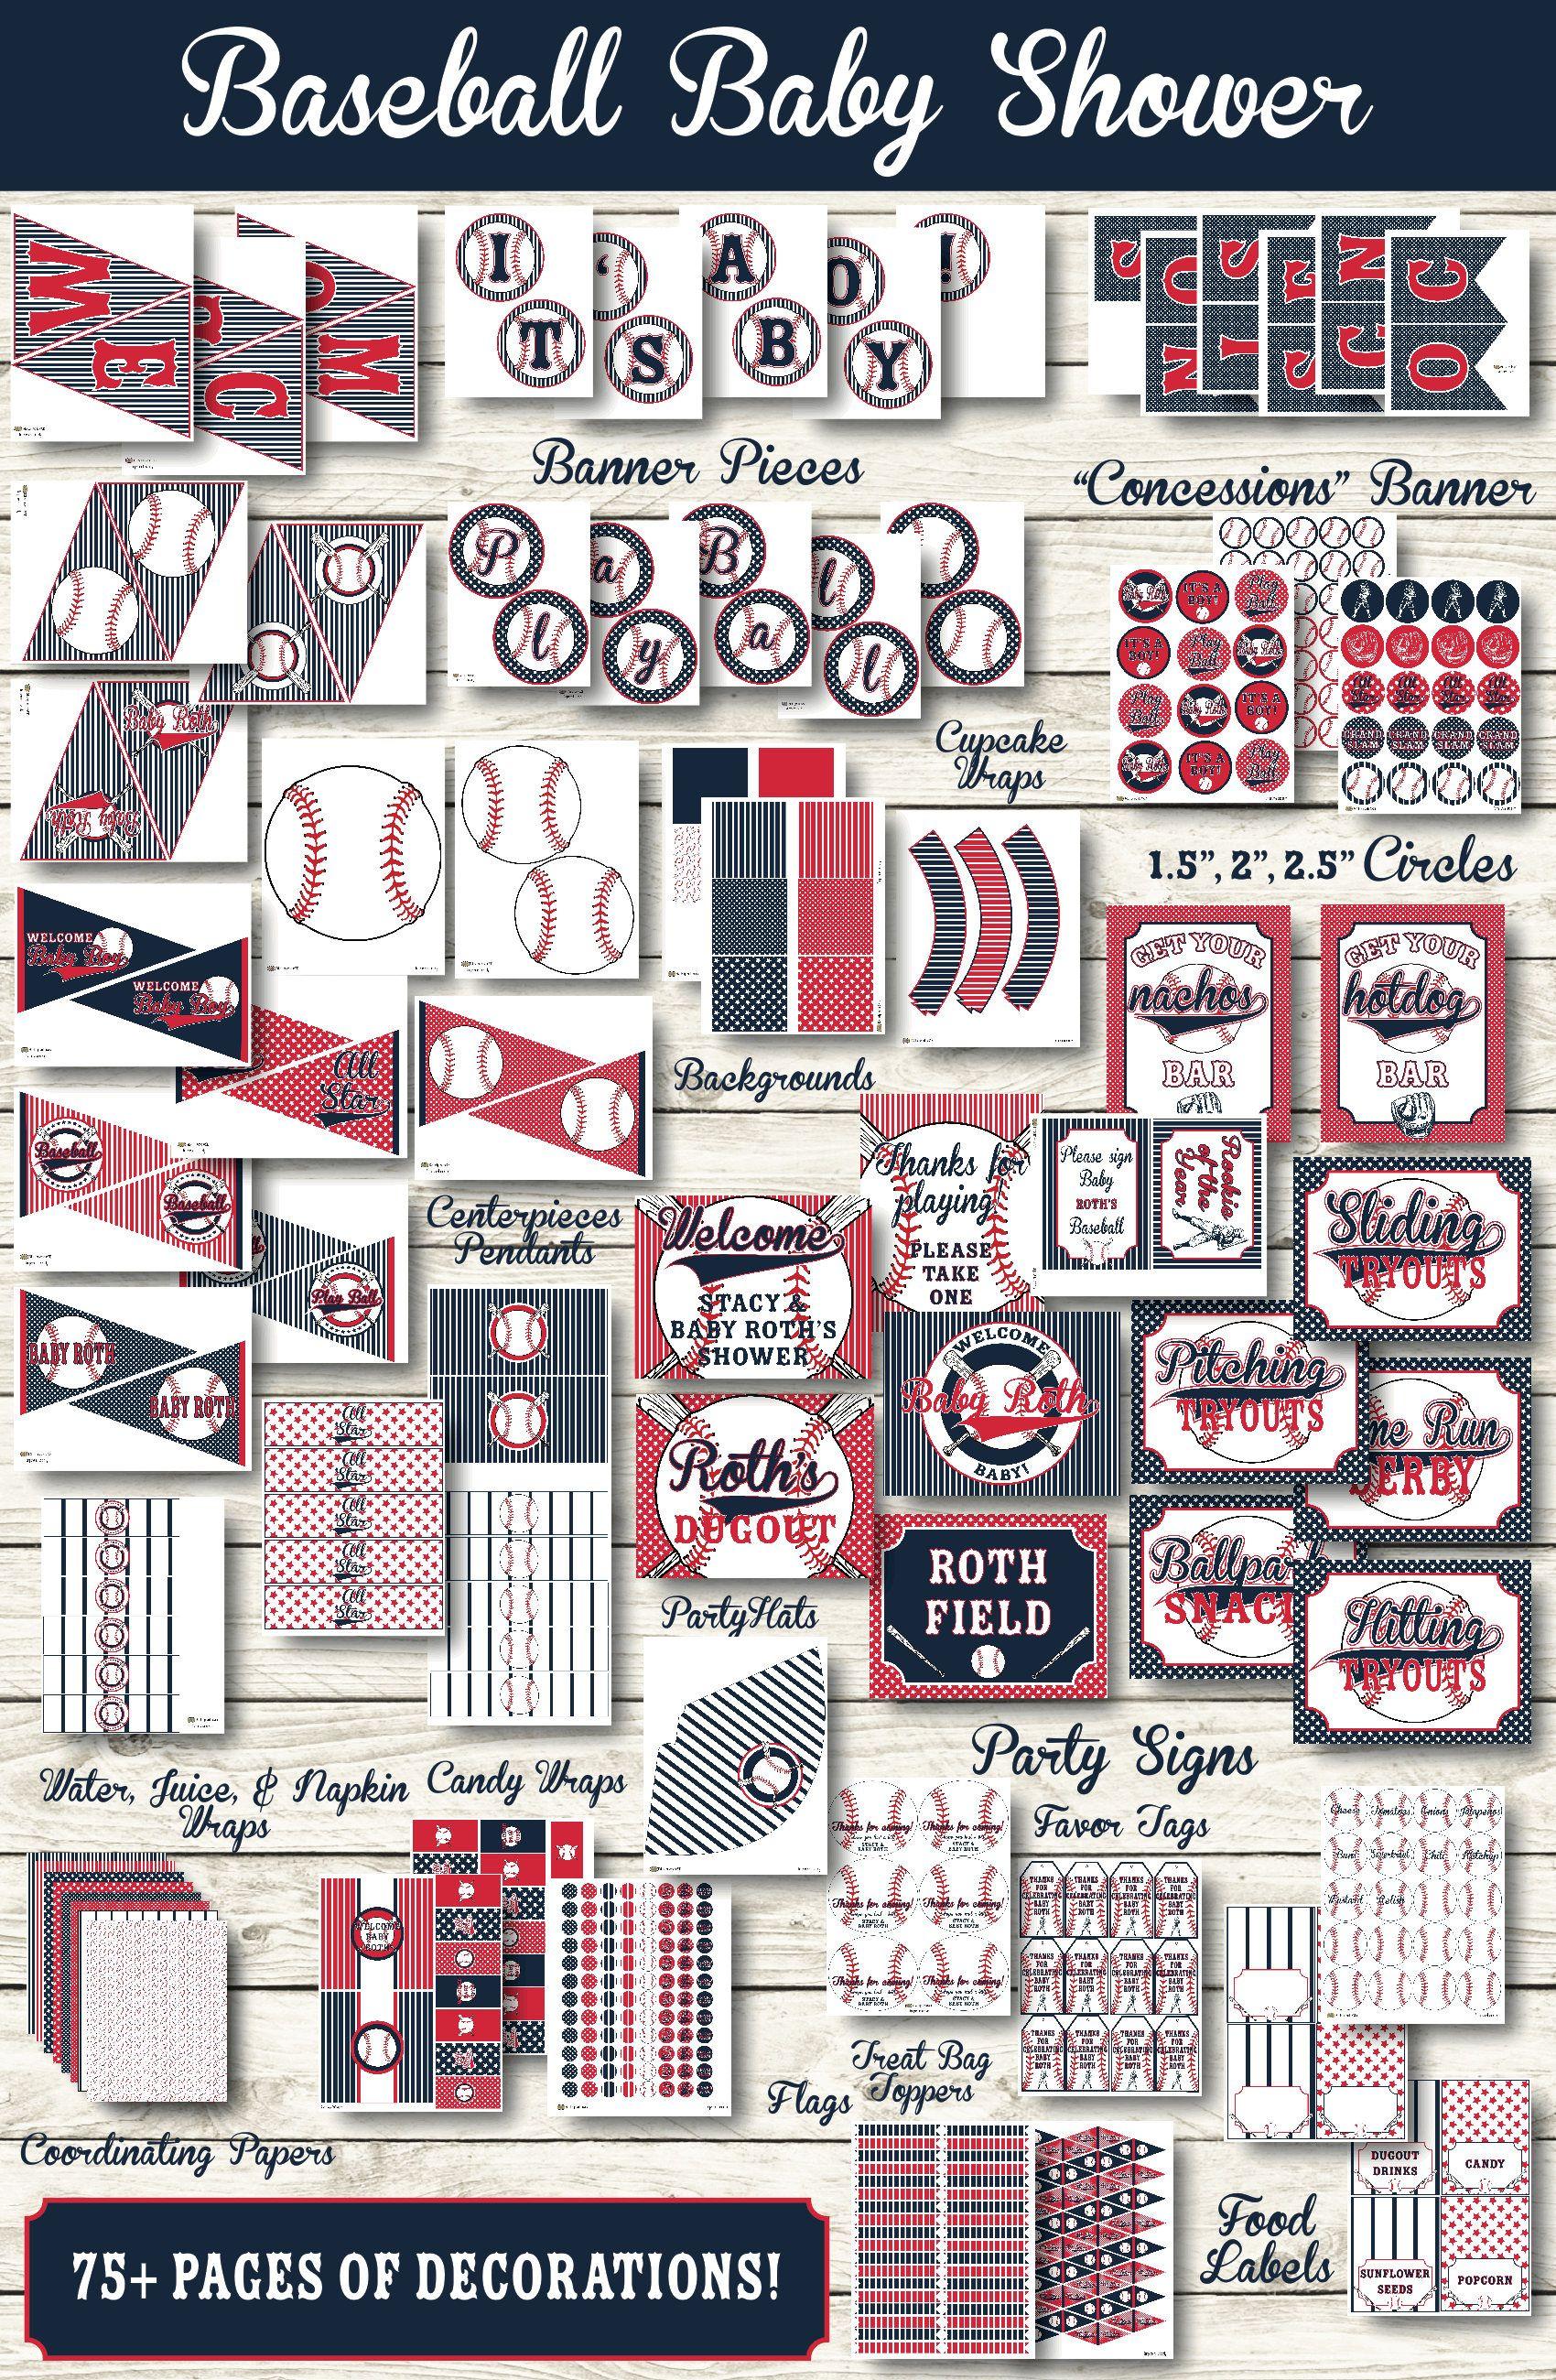 Baseball Shower Decorations   Baseball Party Decorations   Printable  Baseball Party   Baseball Party Decor